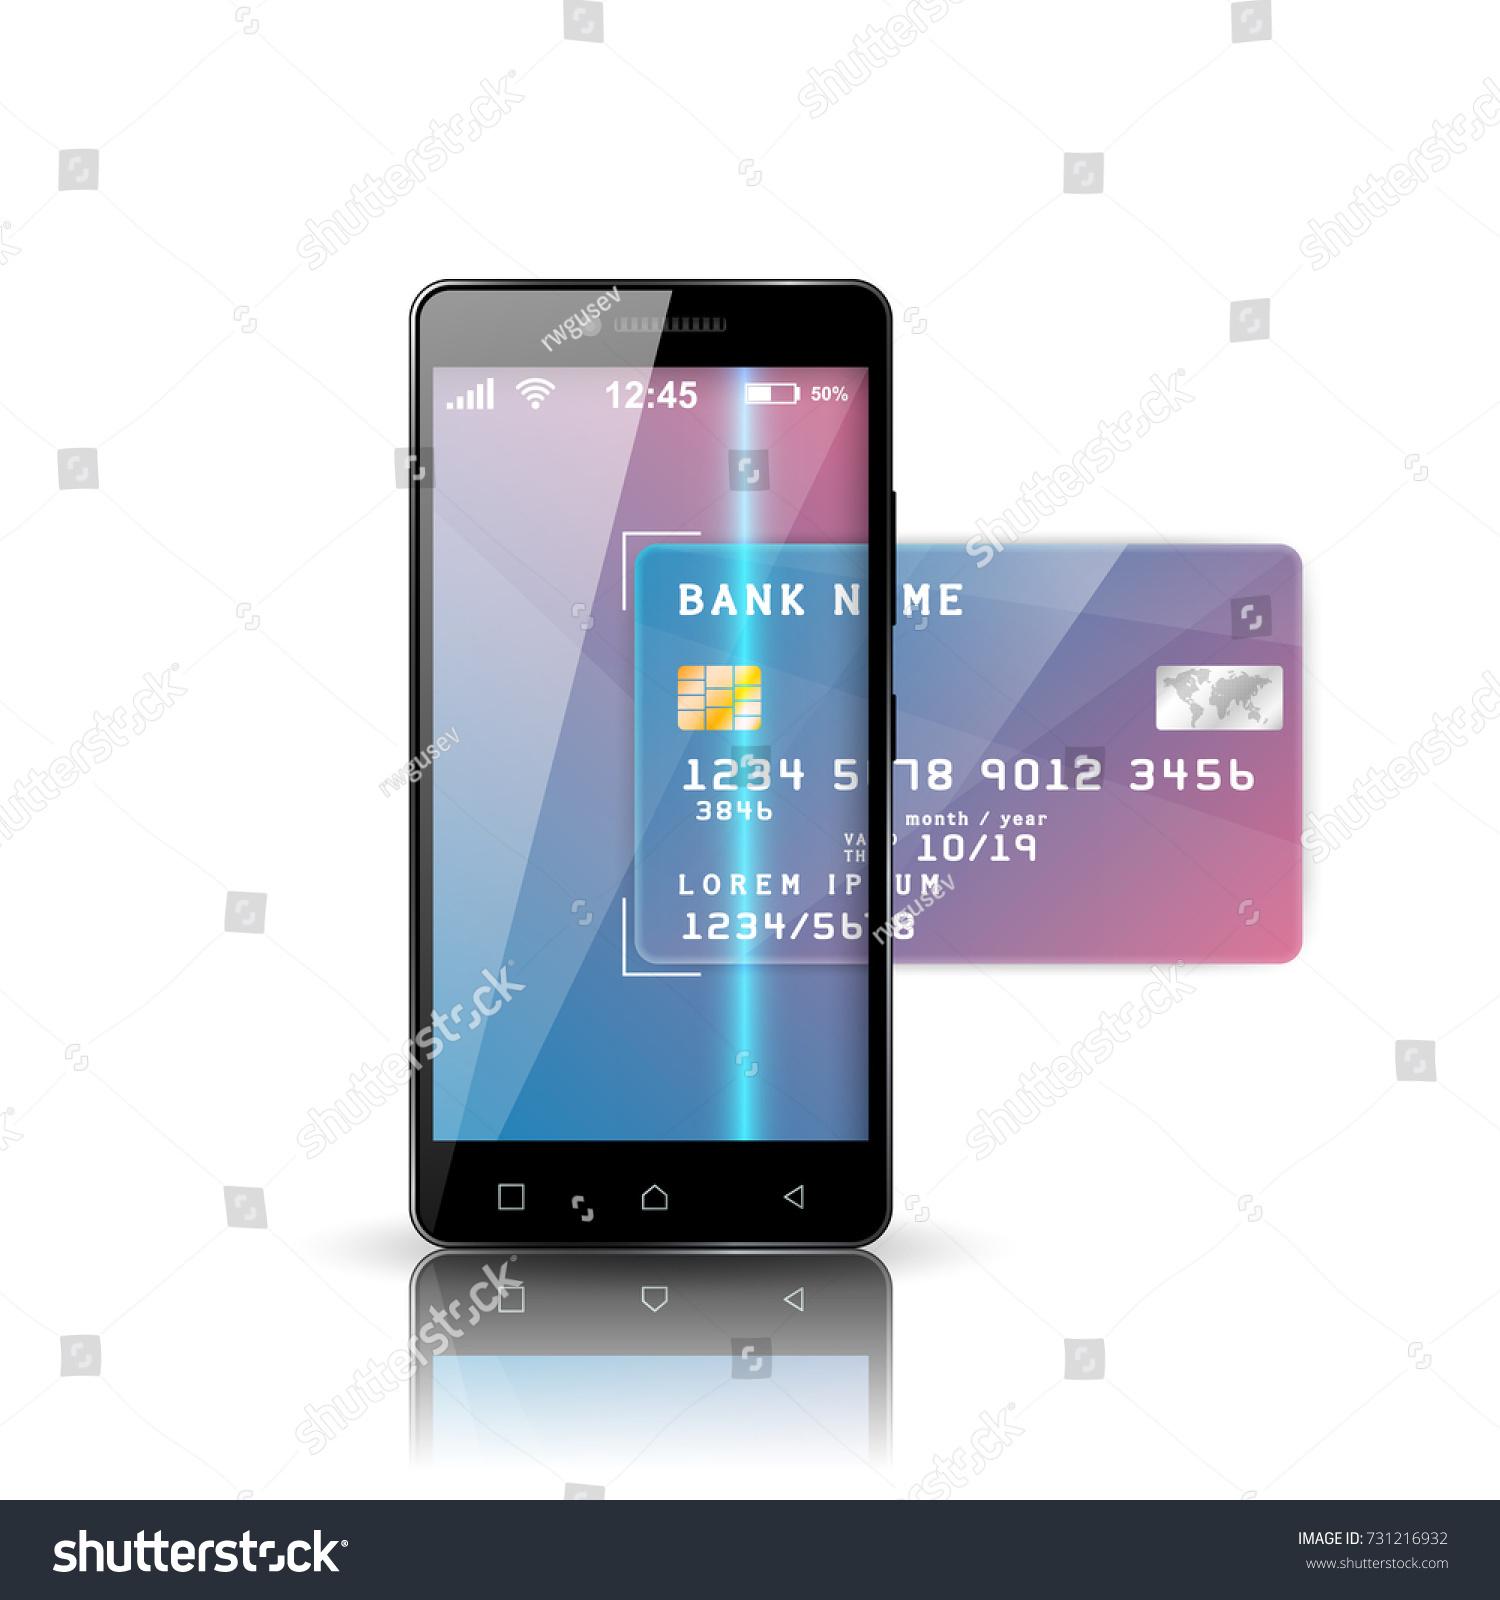 Mobile Bank Illustration Smartphone Business Card Stock Vector ...